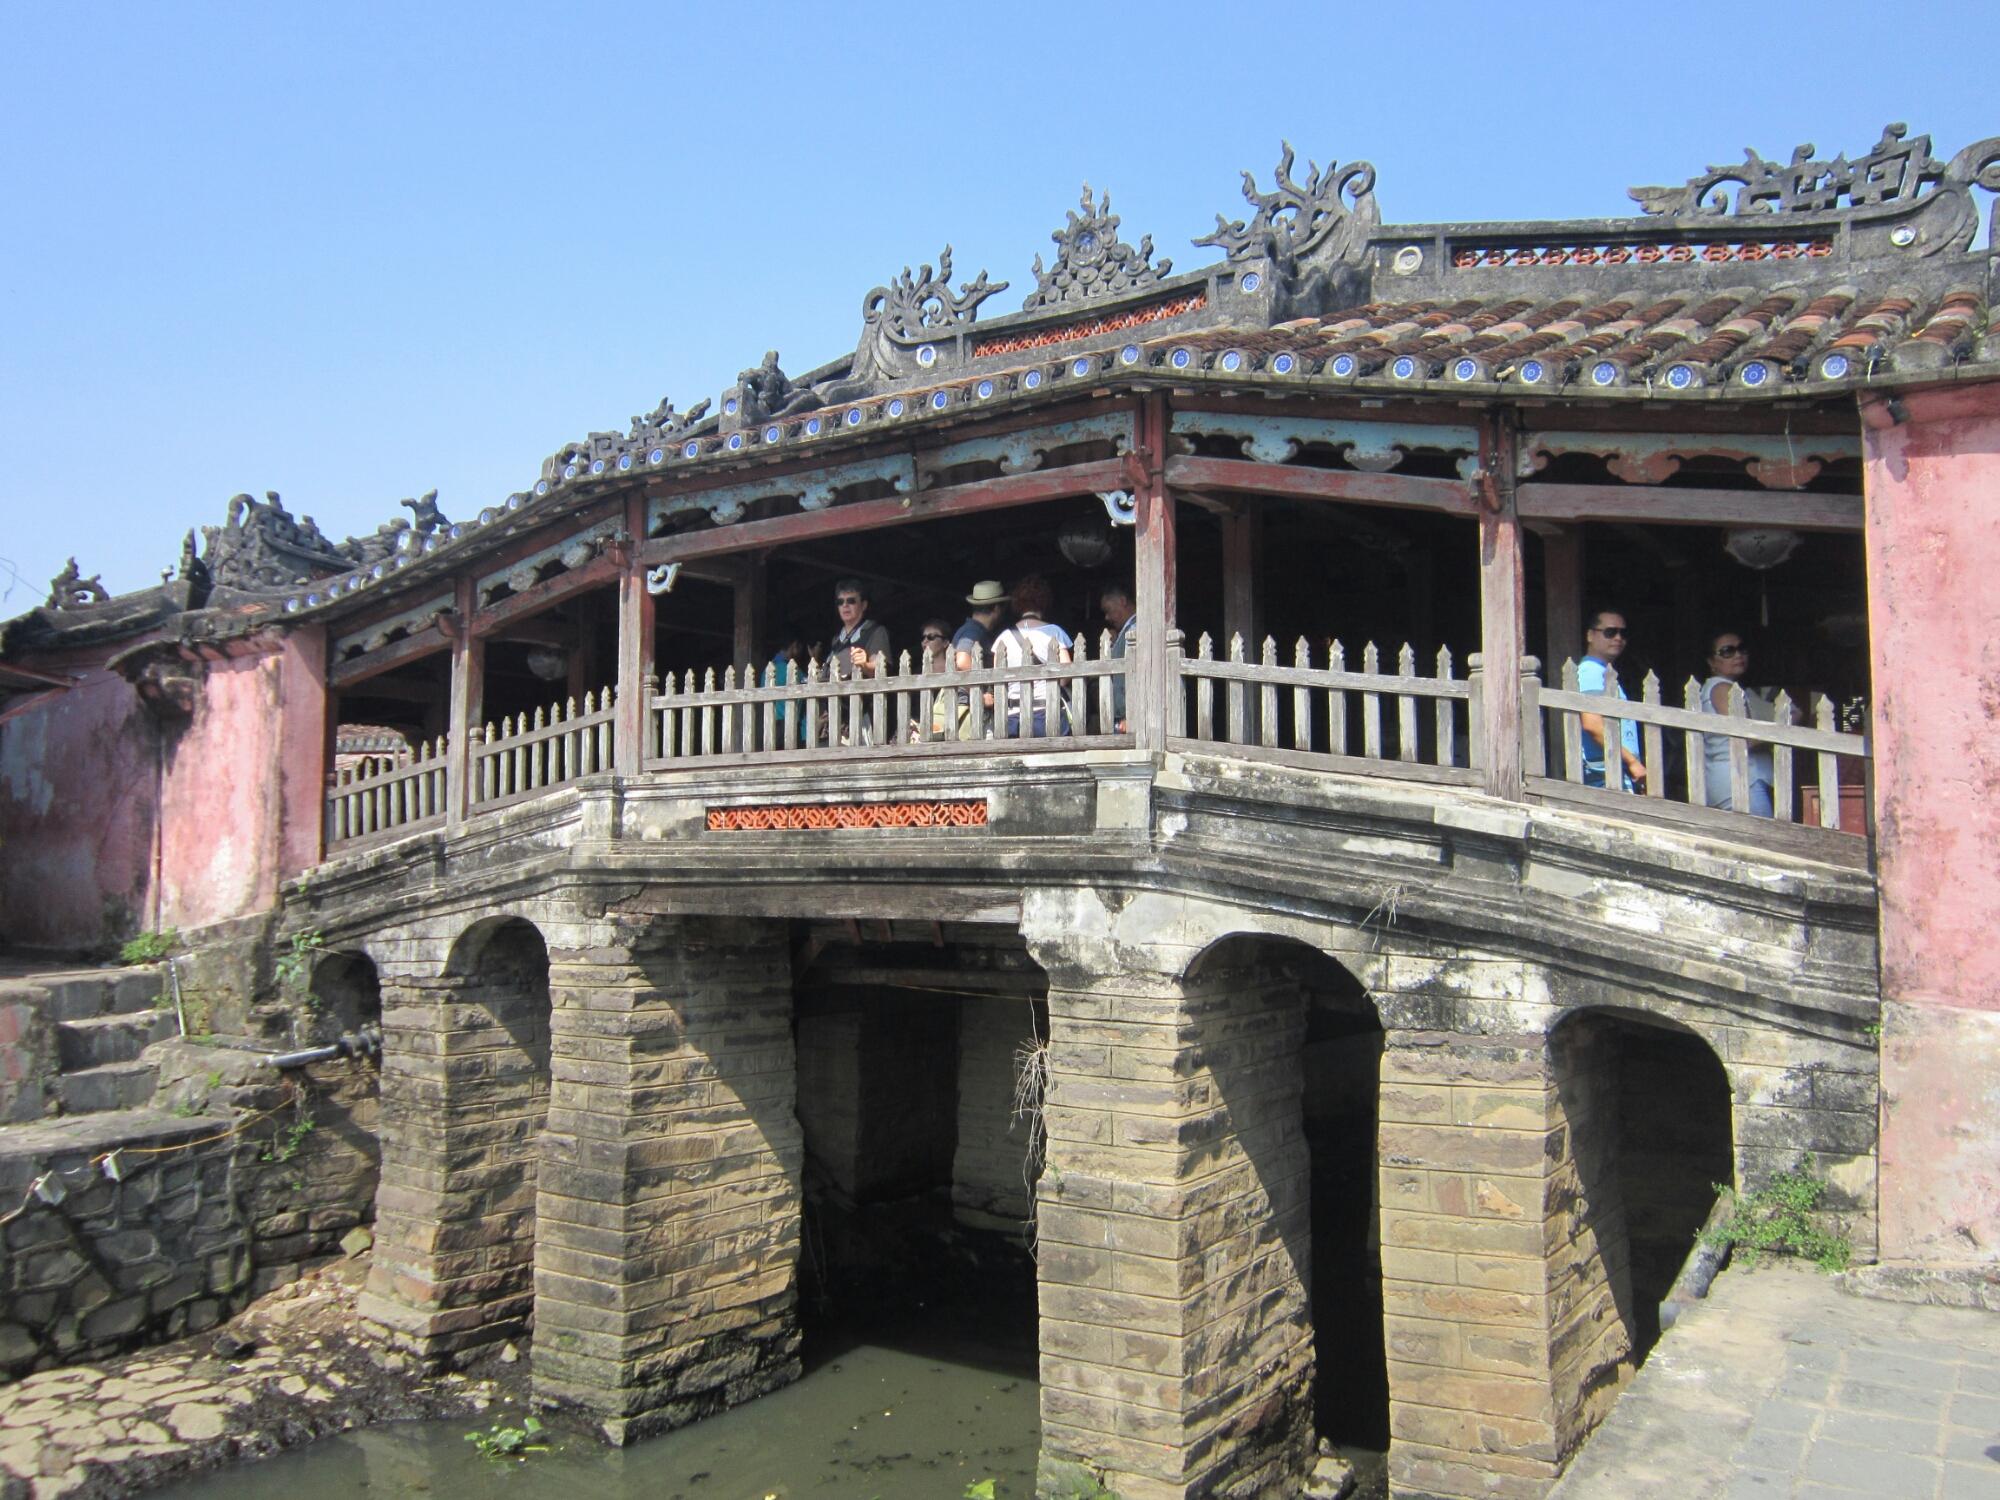 Japanese Bridge - photos of Hoi An